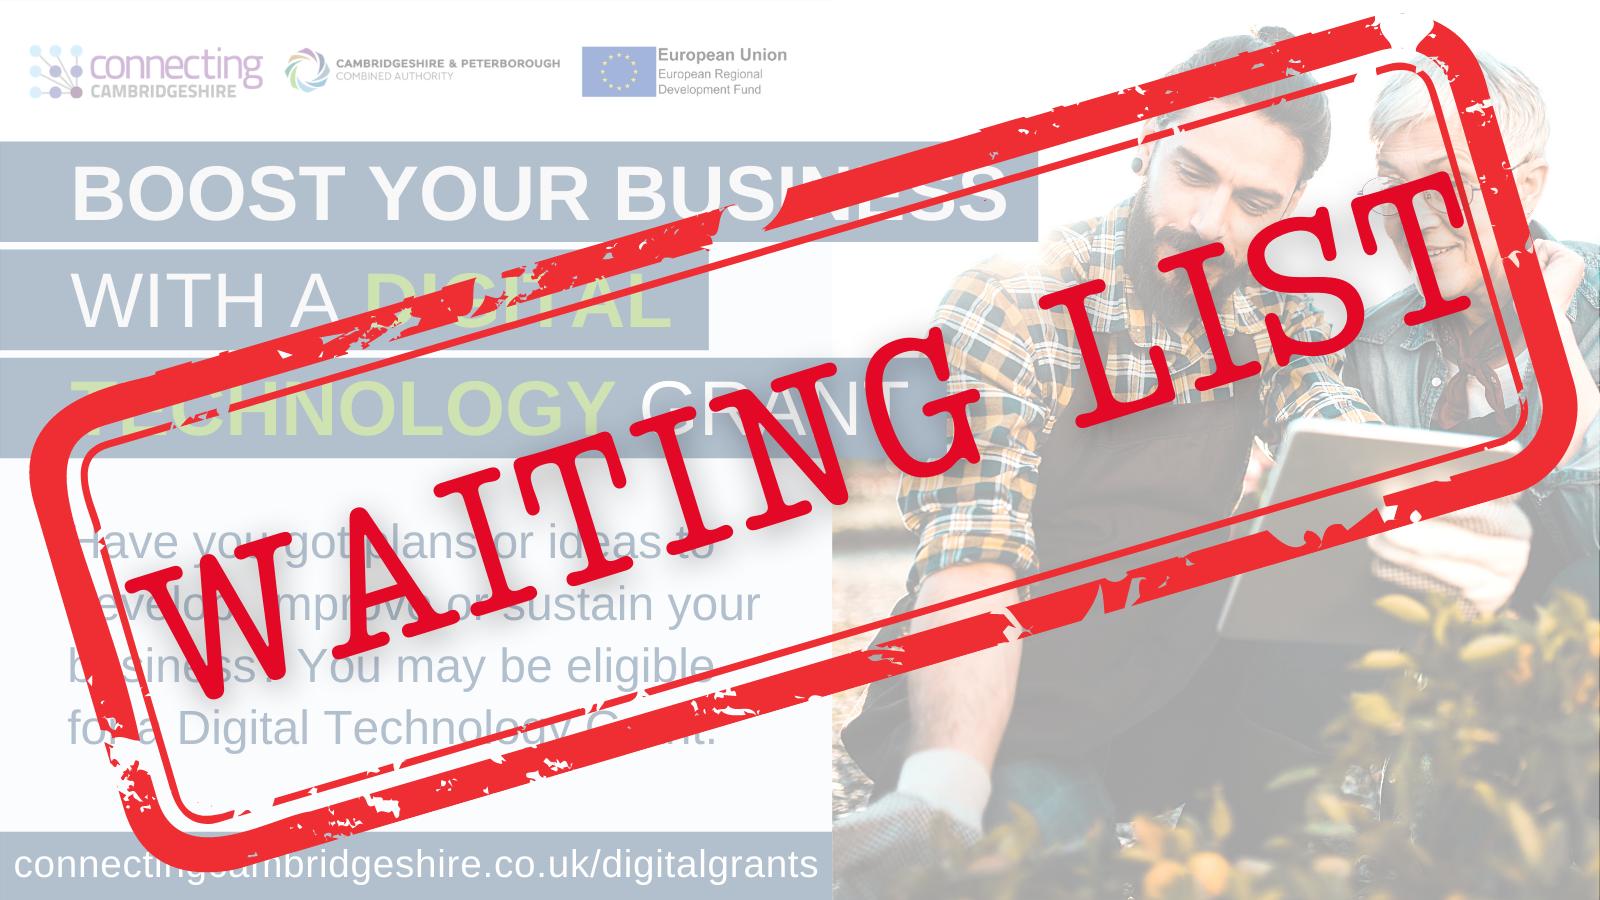 NOTICE: Digital Technology Business Grant Scheme oversubscribed